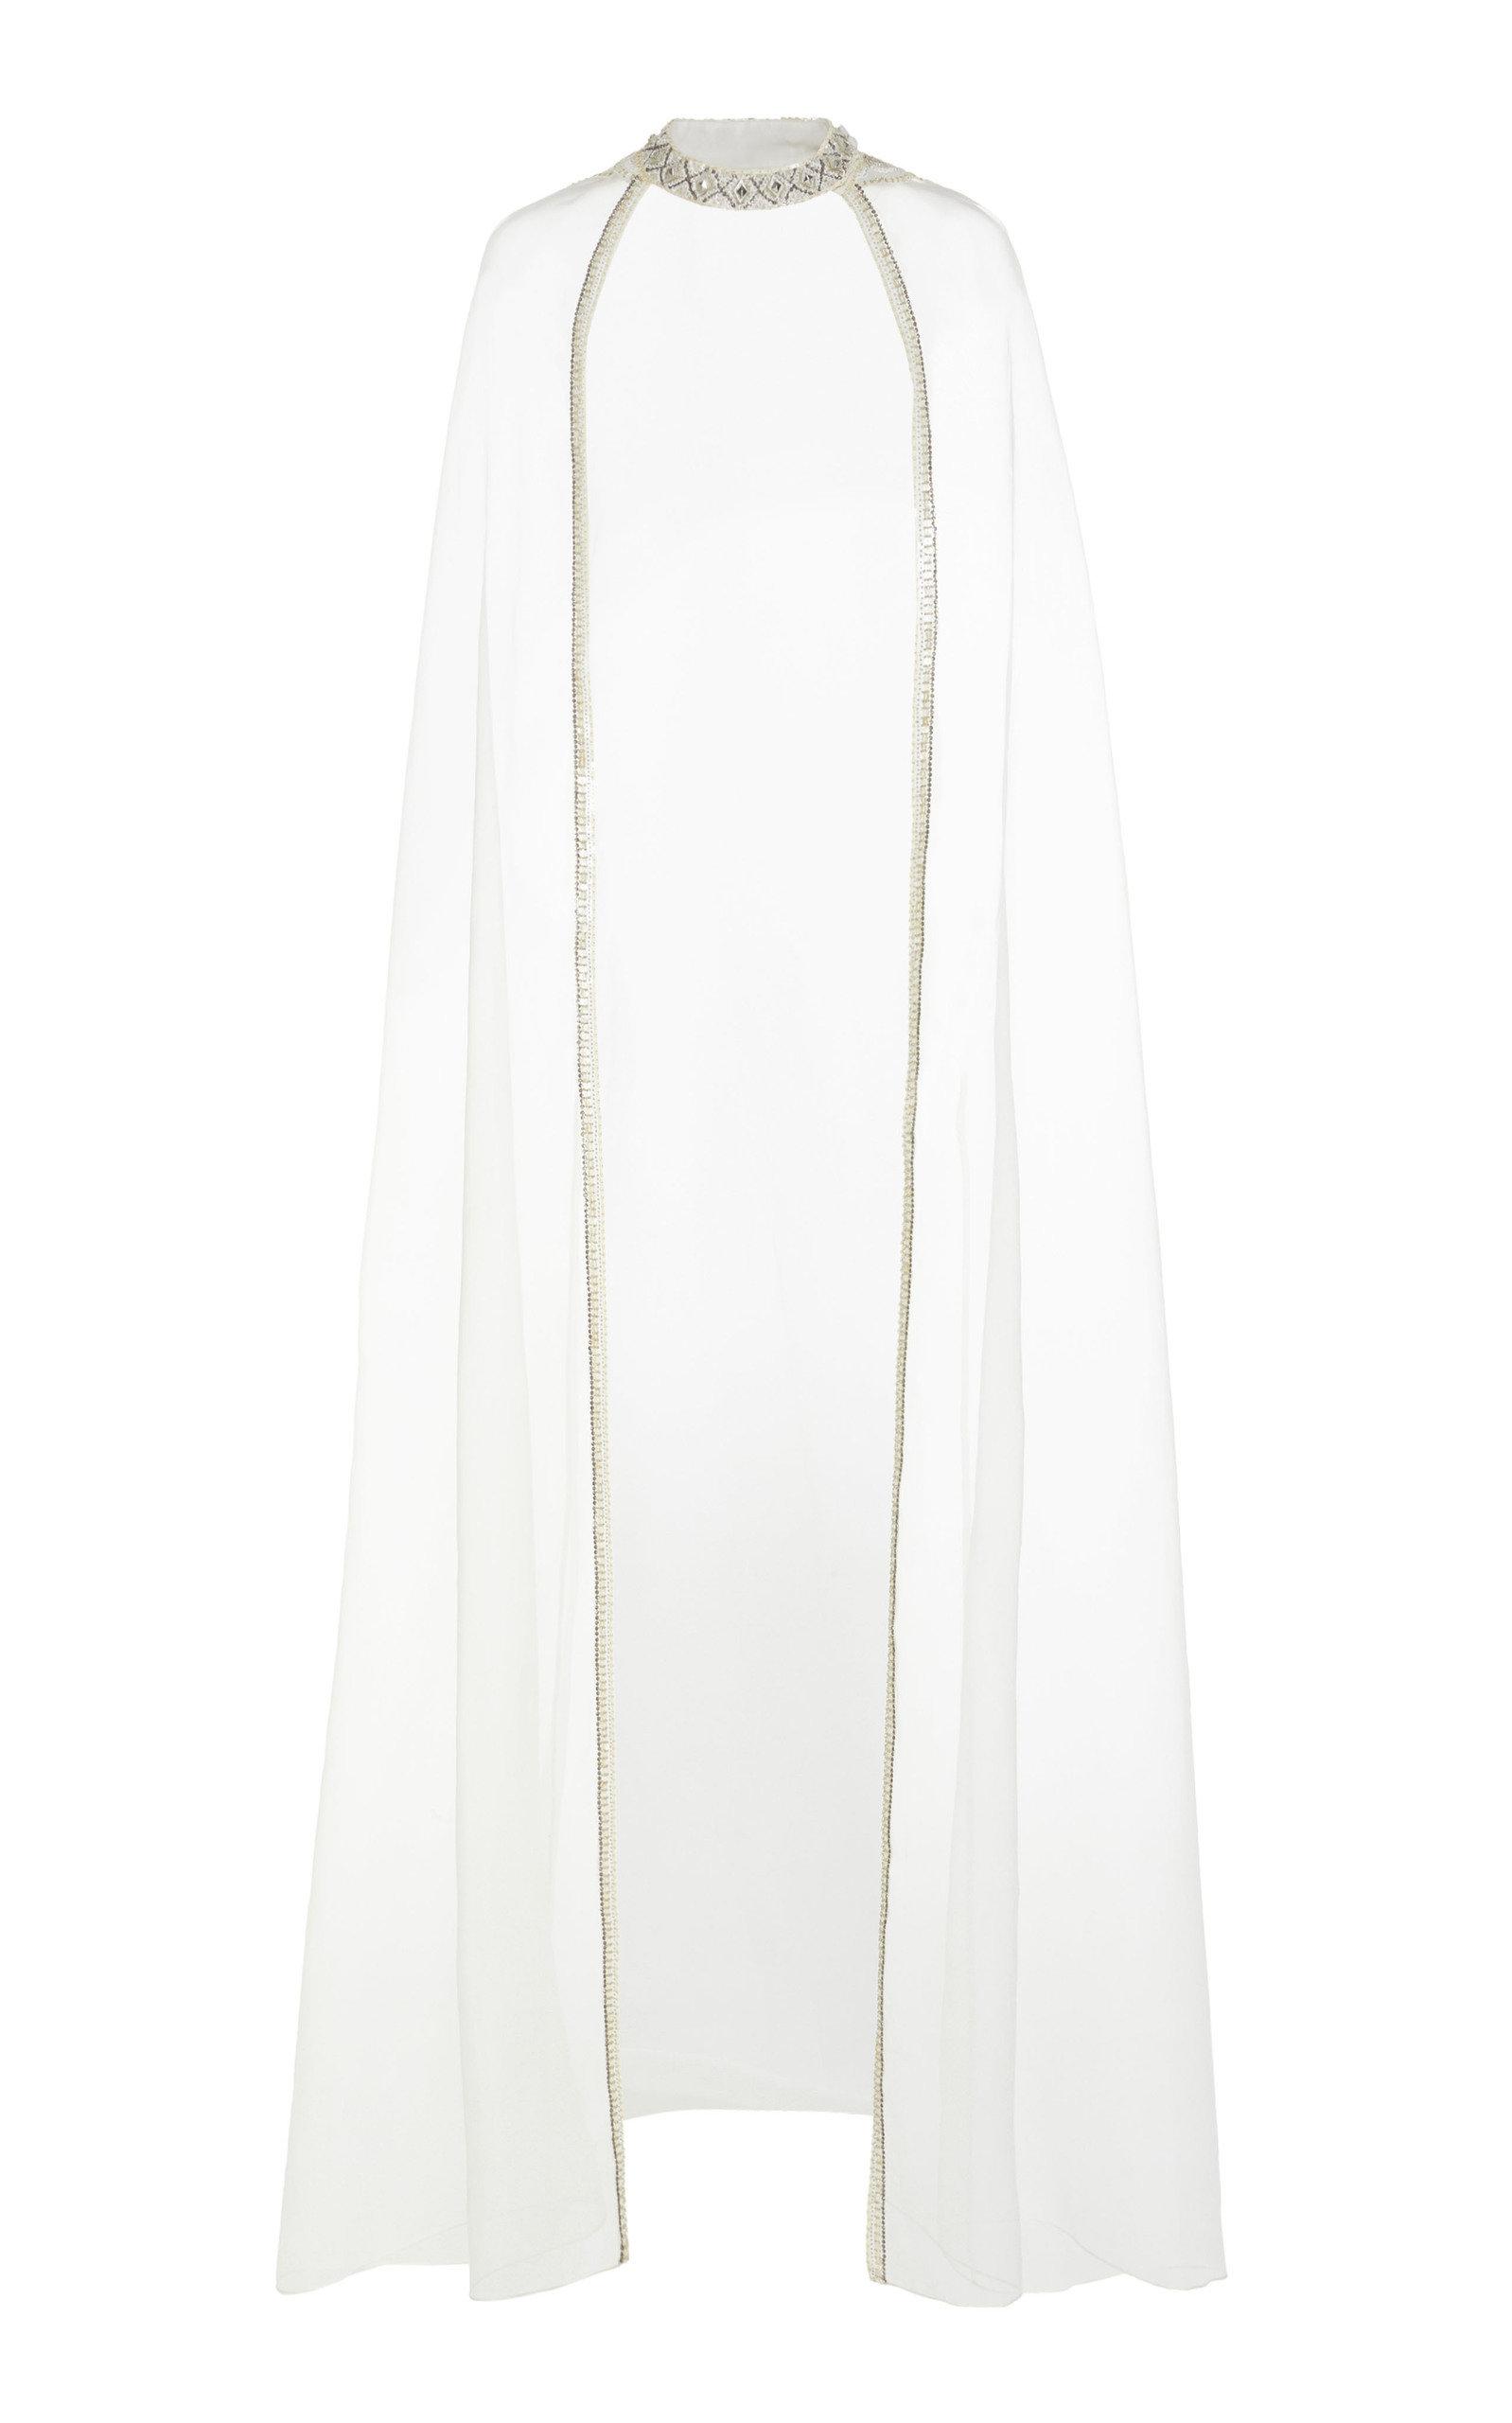 CUCCULELLI SHAHEEN Pearlescent Silk Cape in White